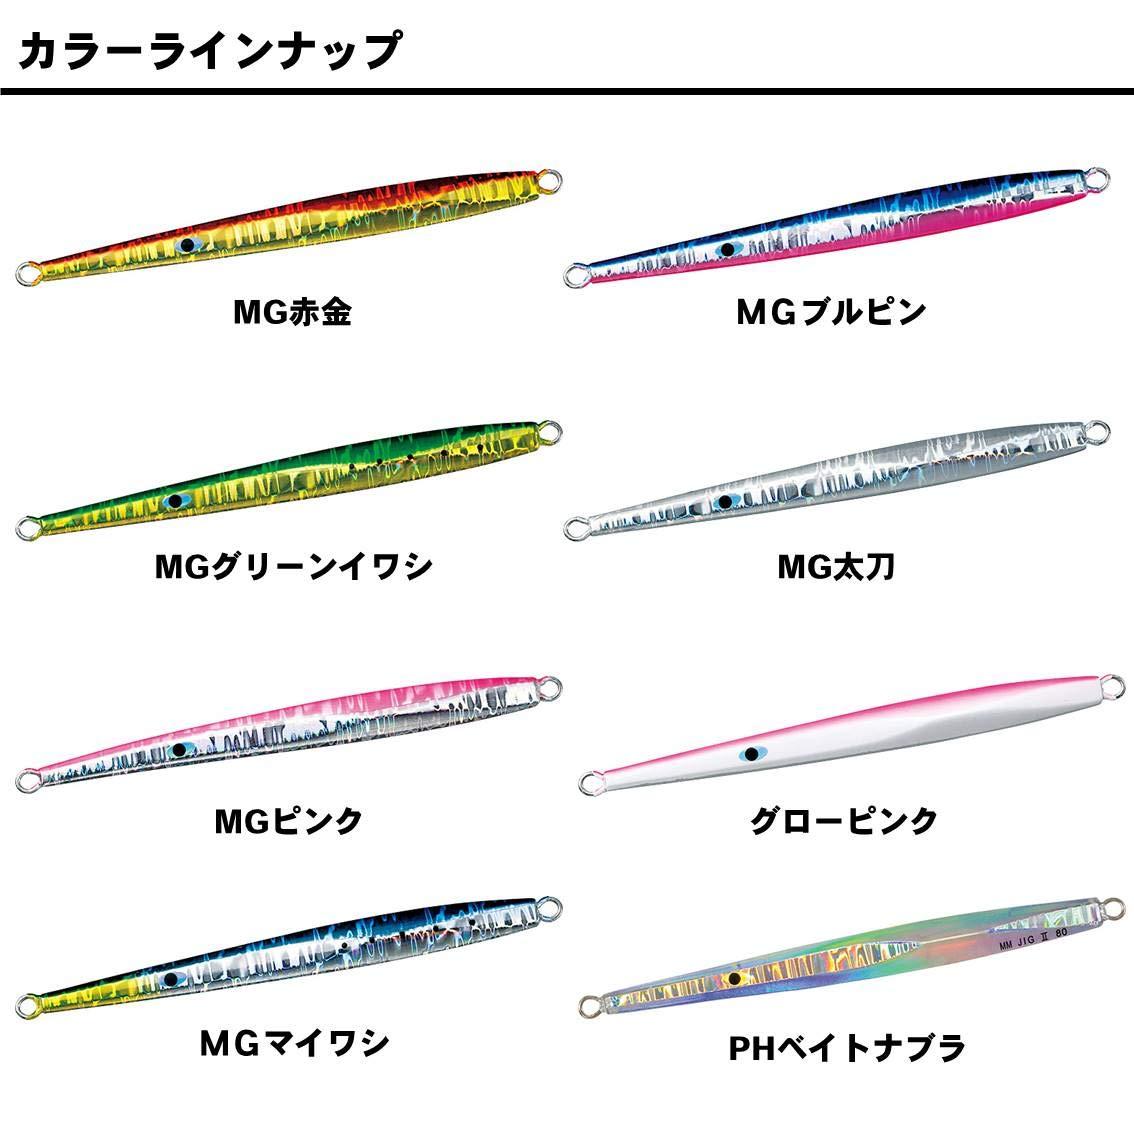 Daiwa metal jig lure MM (Murakoshi Max) jig 2 2 2 150g MG